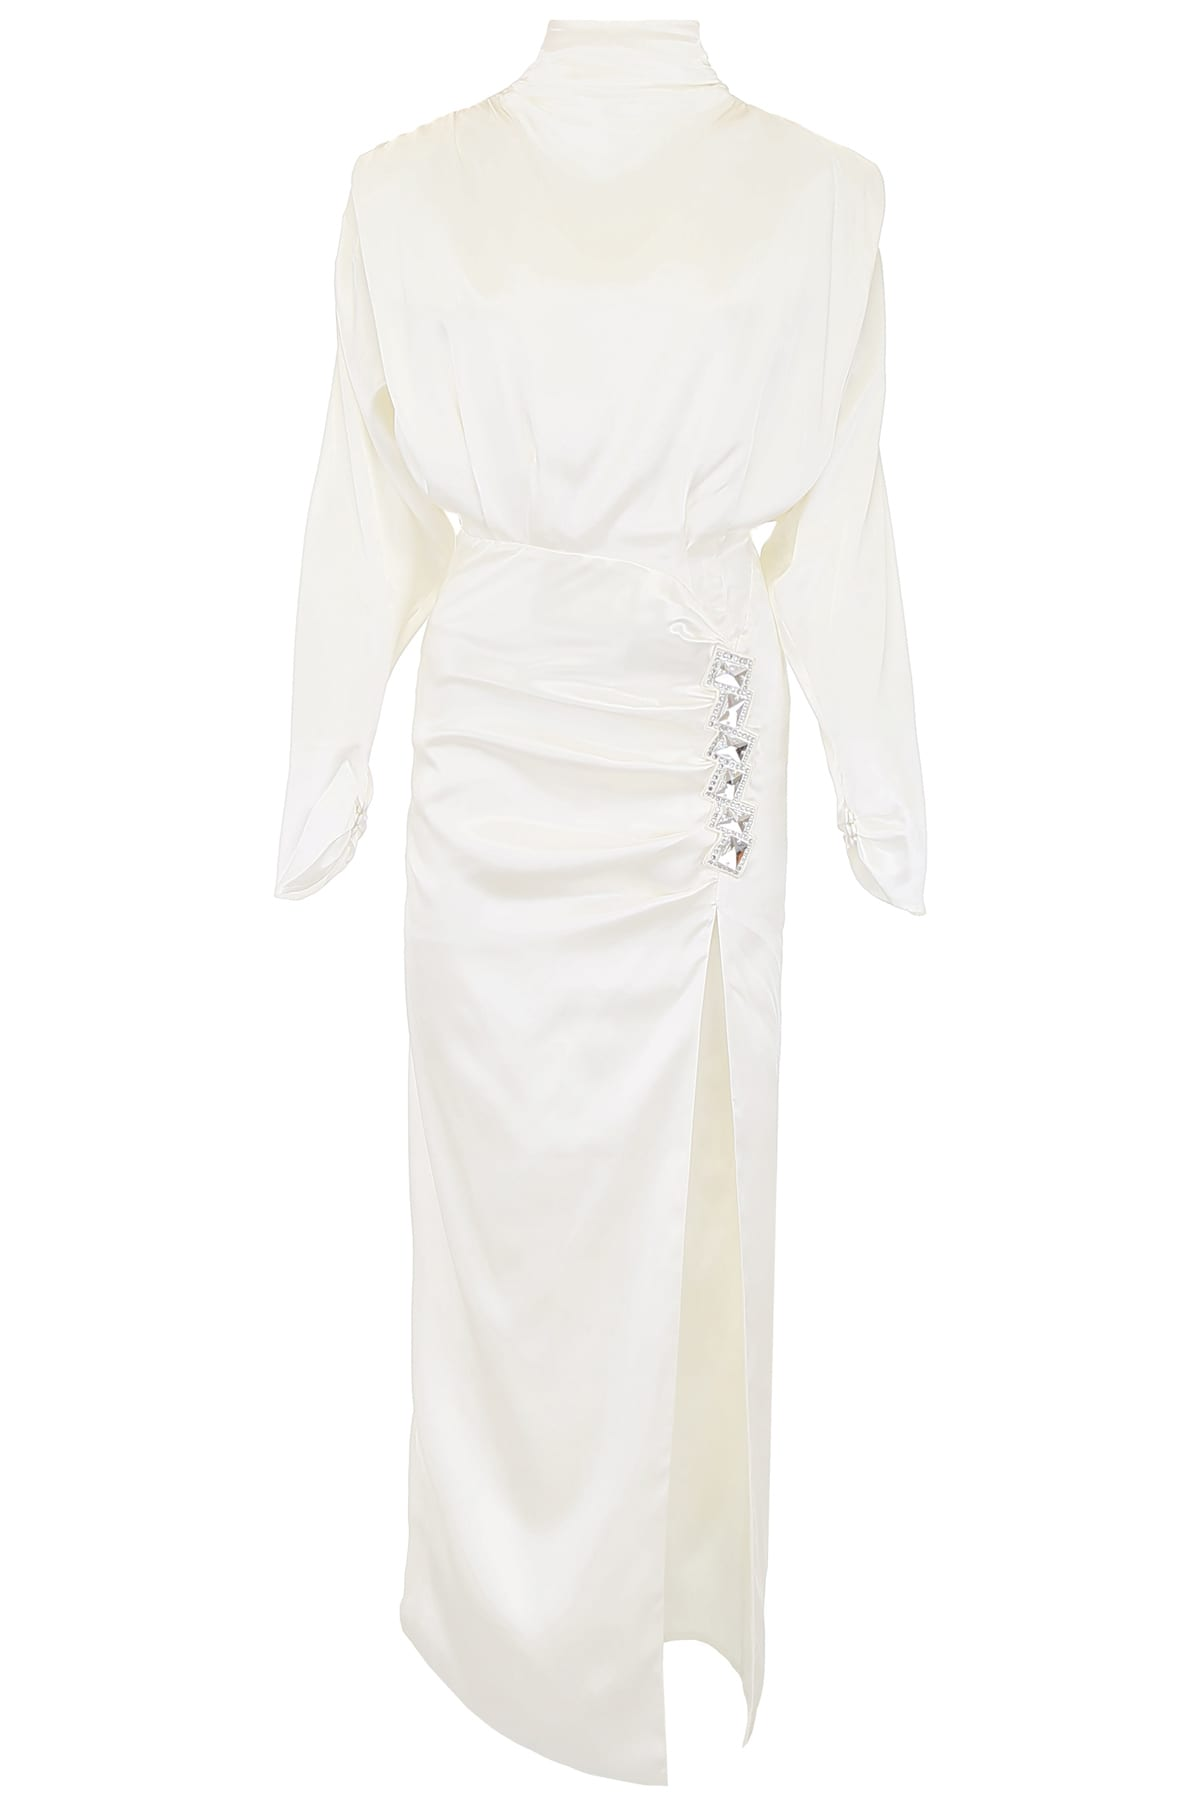 Alessandra Rich High Neck Dress